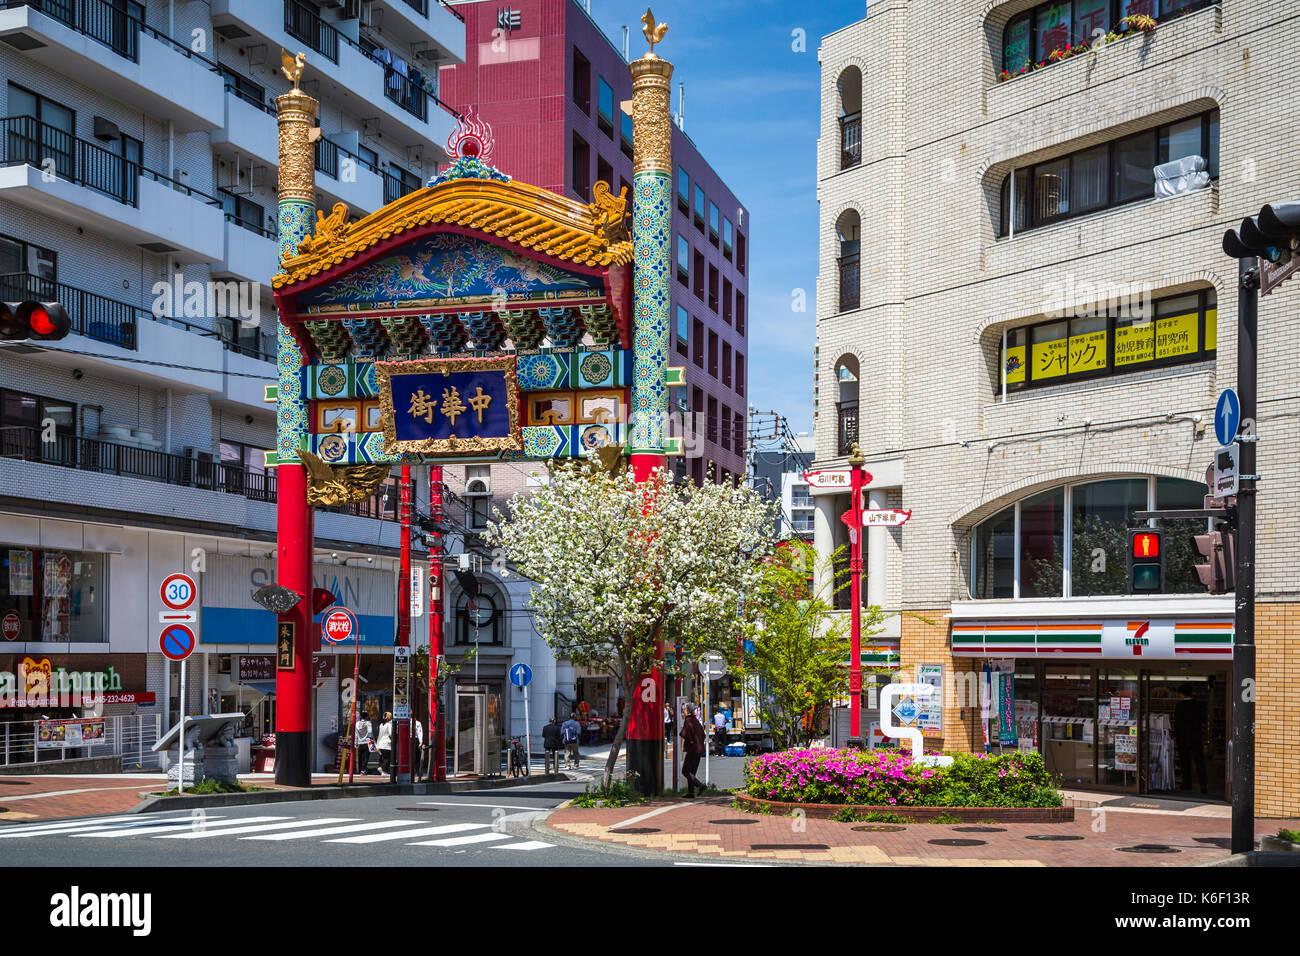 The Goodwill Gate in Chinatown, Yokohama, Japan, Asia. - Stock Image